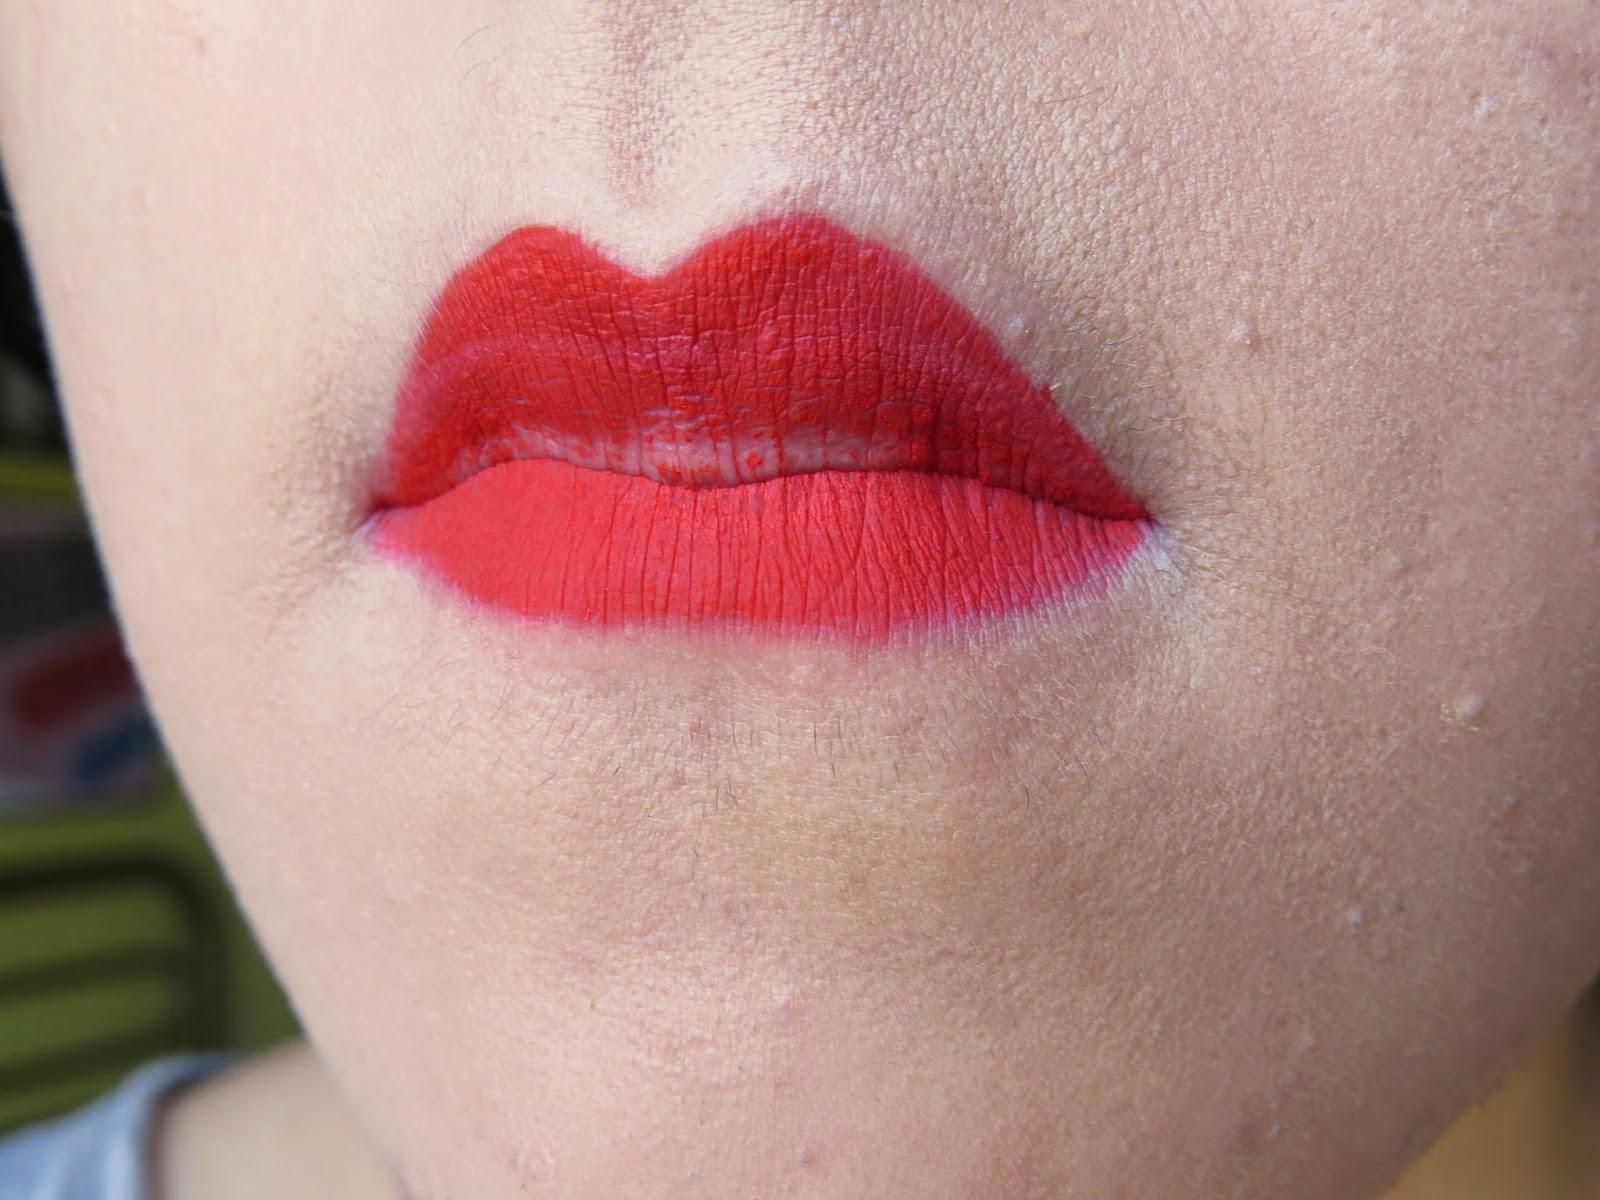 Born Pretty Store Lip Gloss Waterproof Matte Velvet